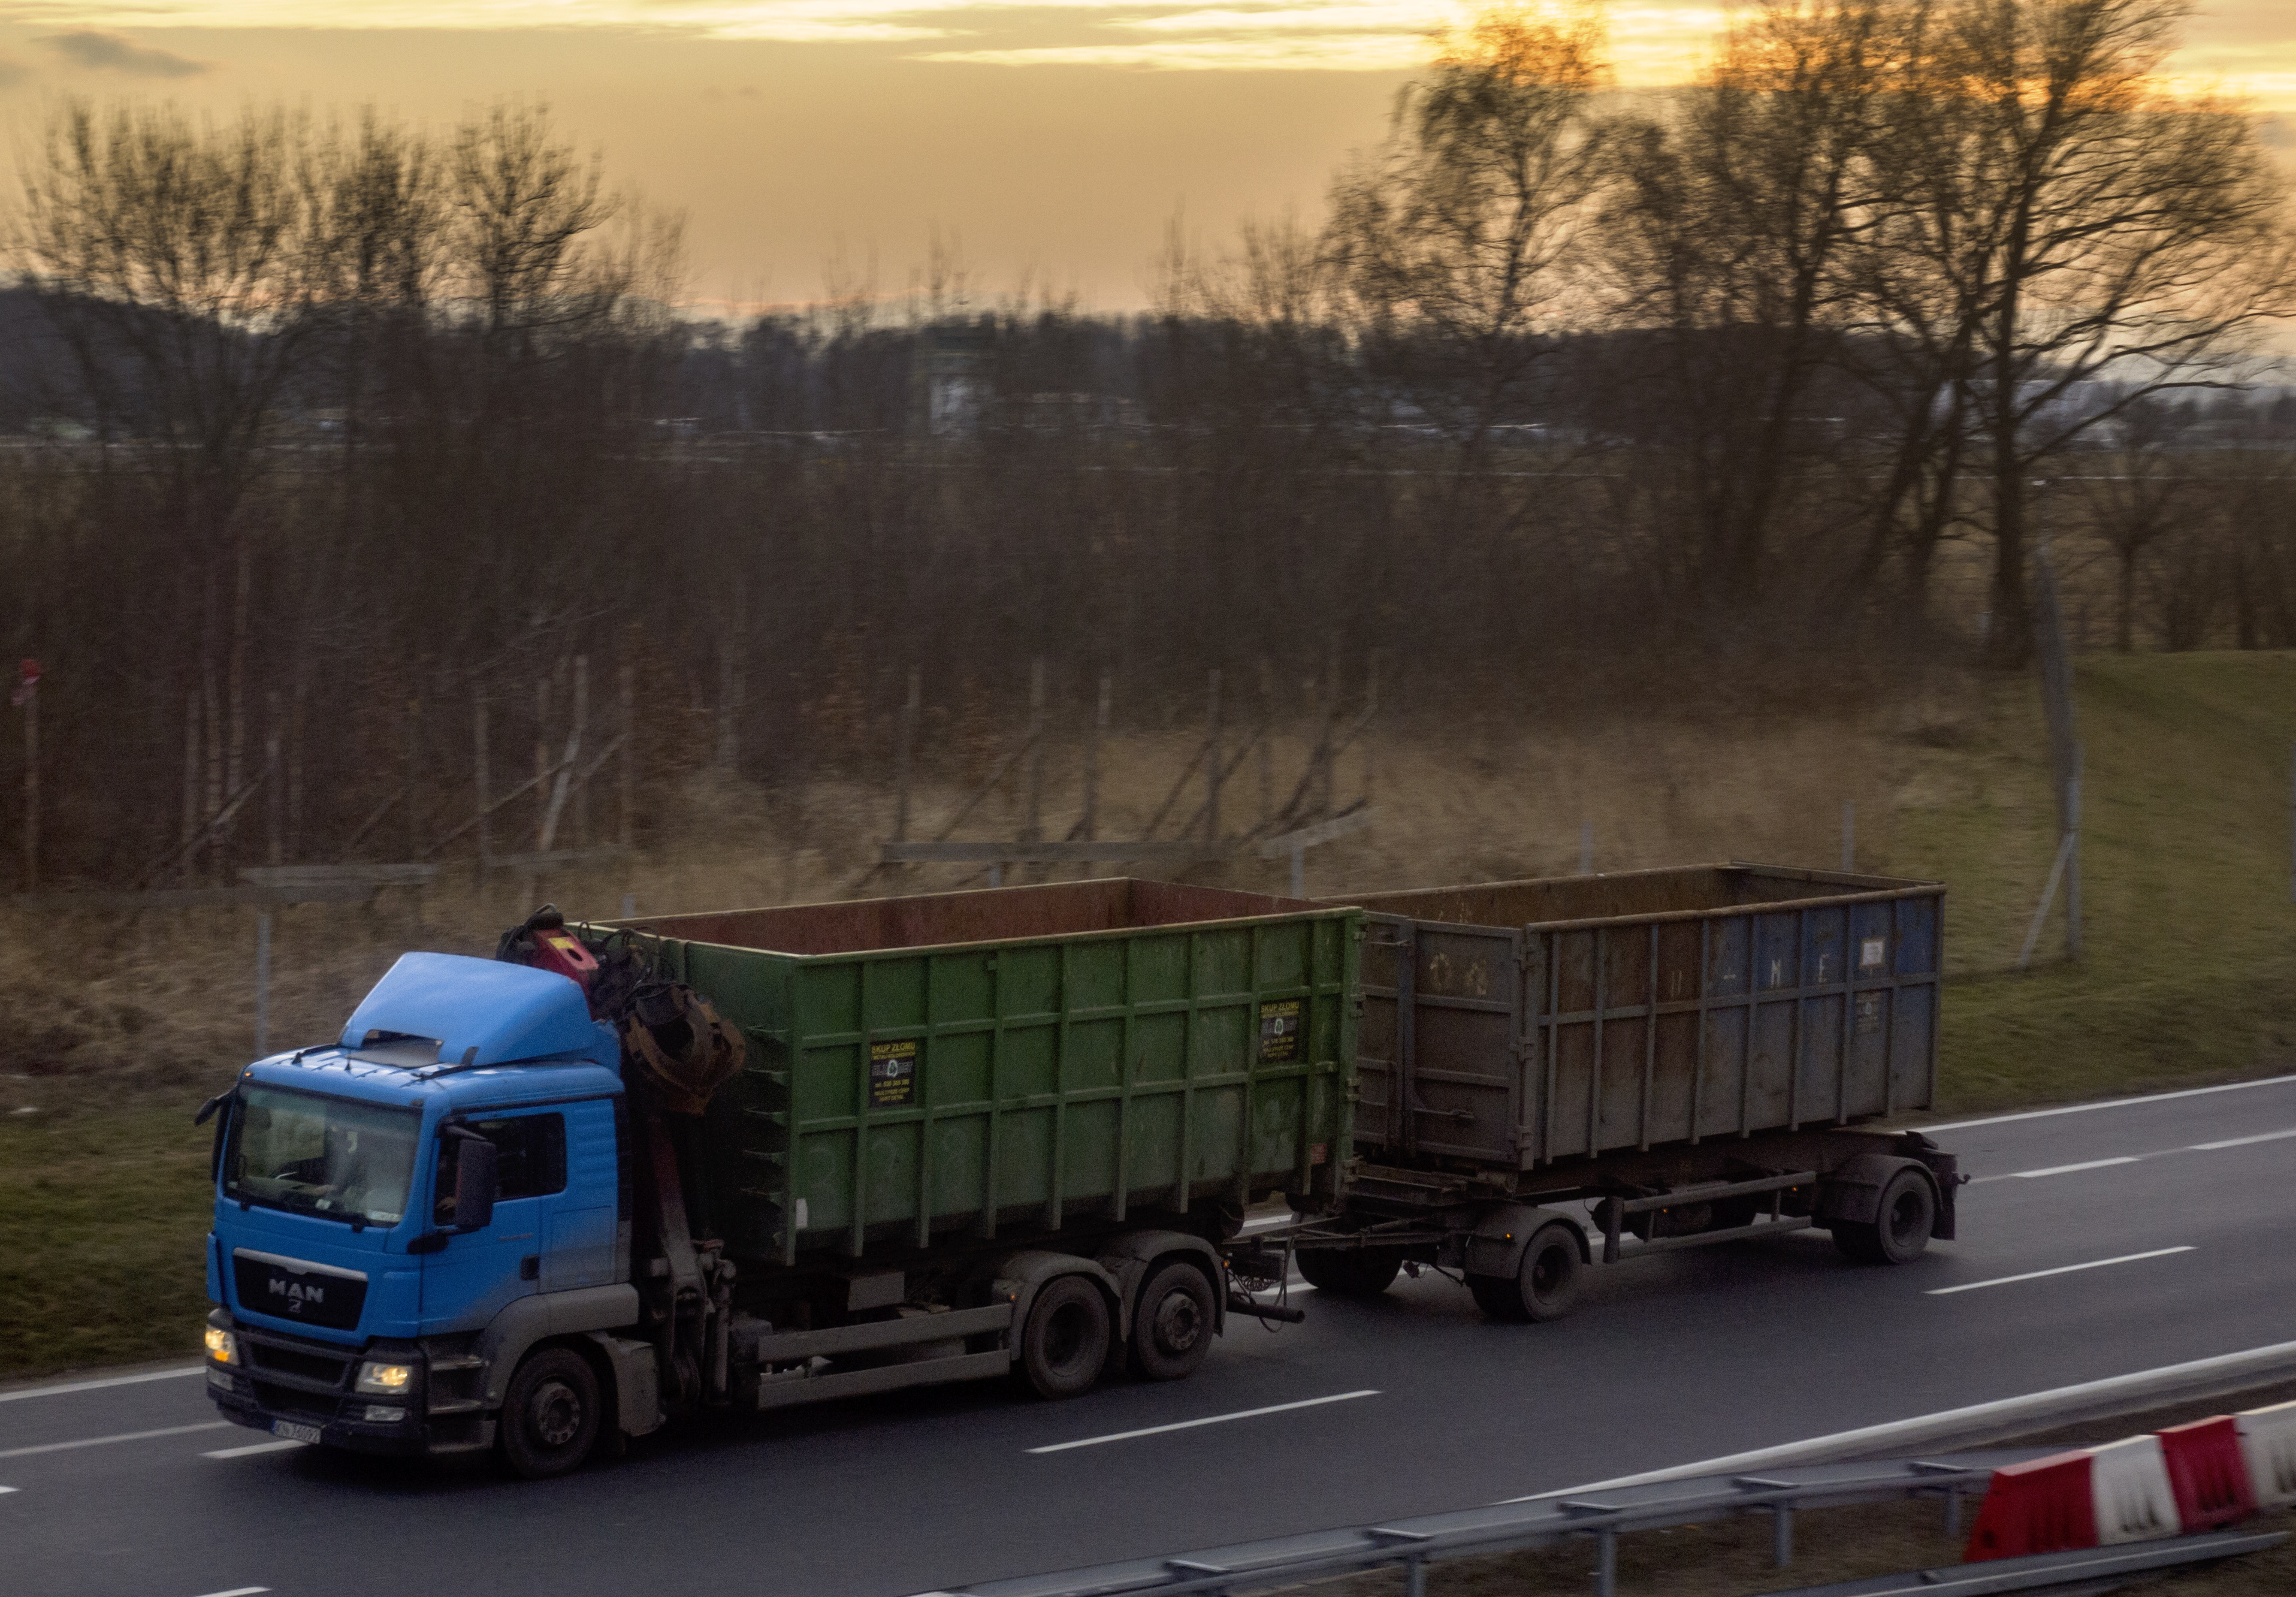 Man truck, Car, Forwarding, Freight, Goods, HQ Photo